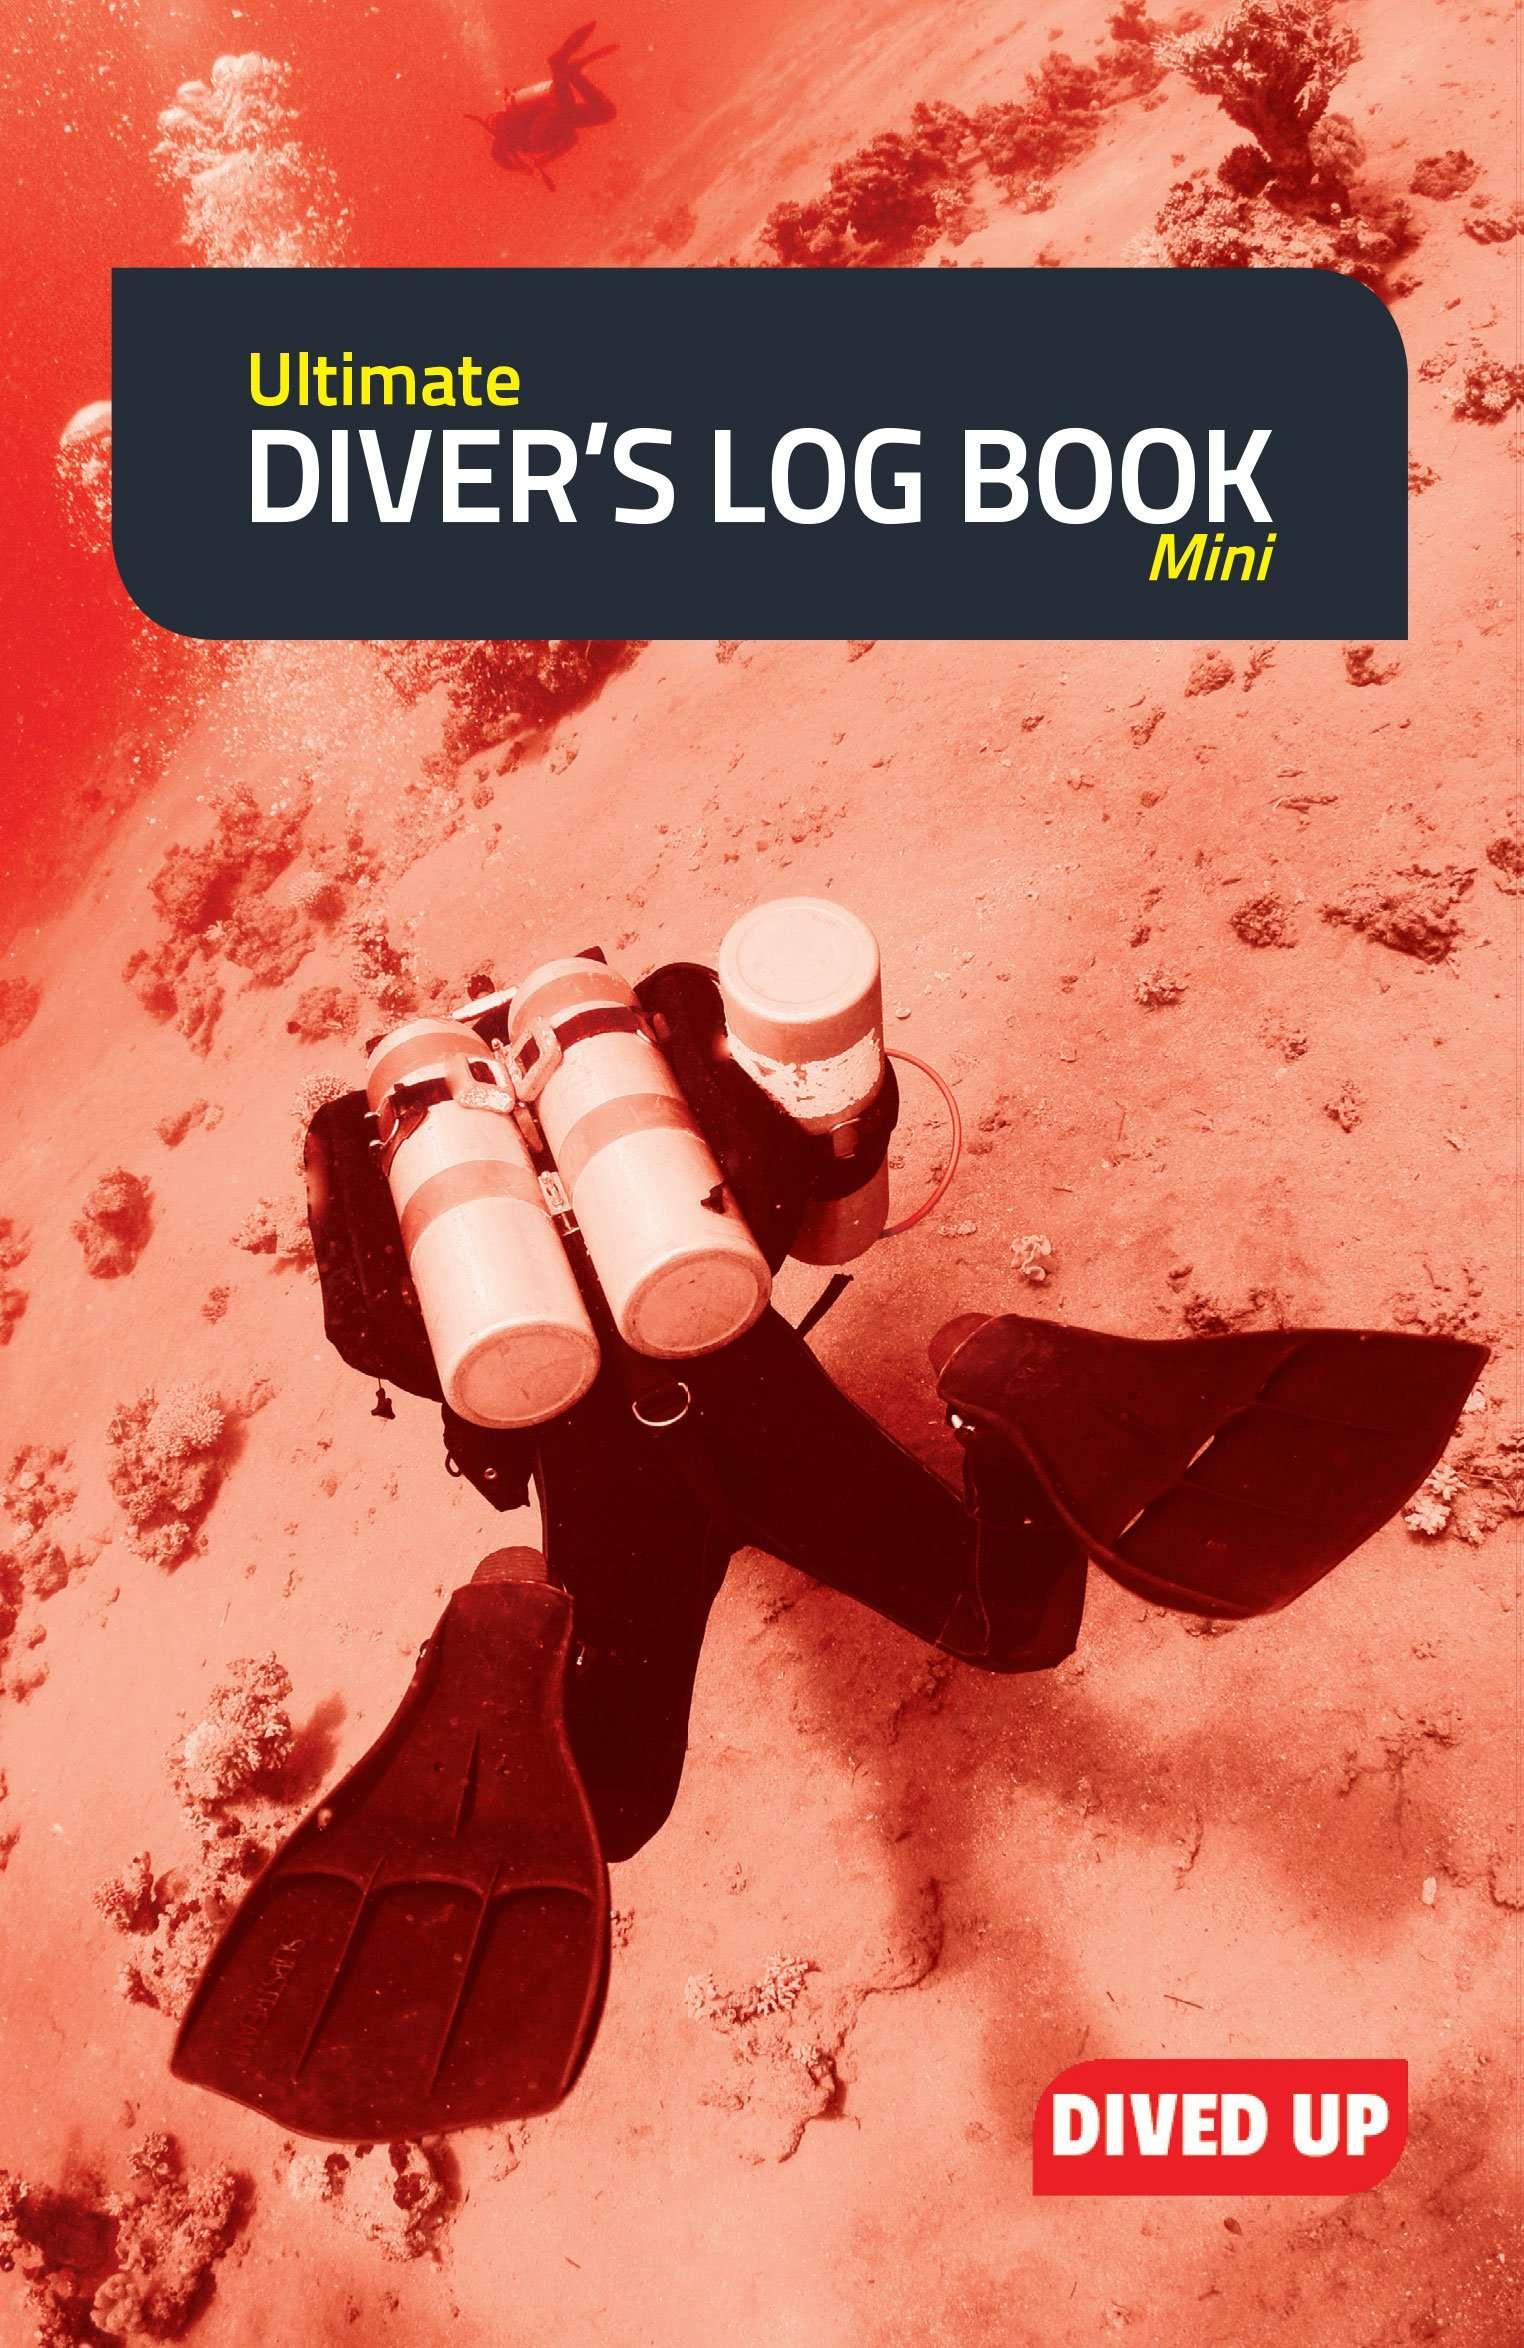 9781909455078 Ultimate Diver's Log Book (mini) – cover